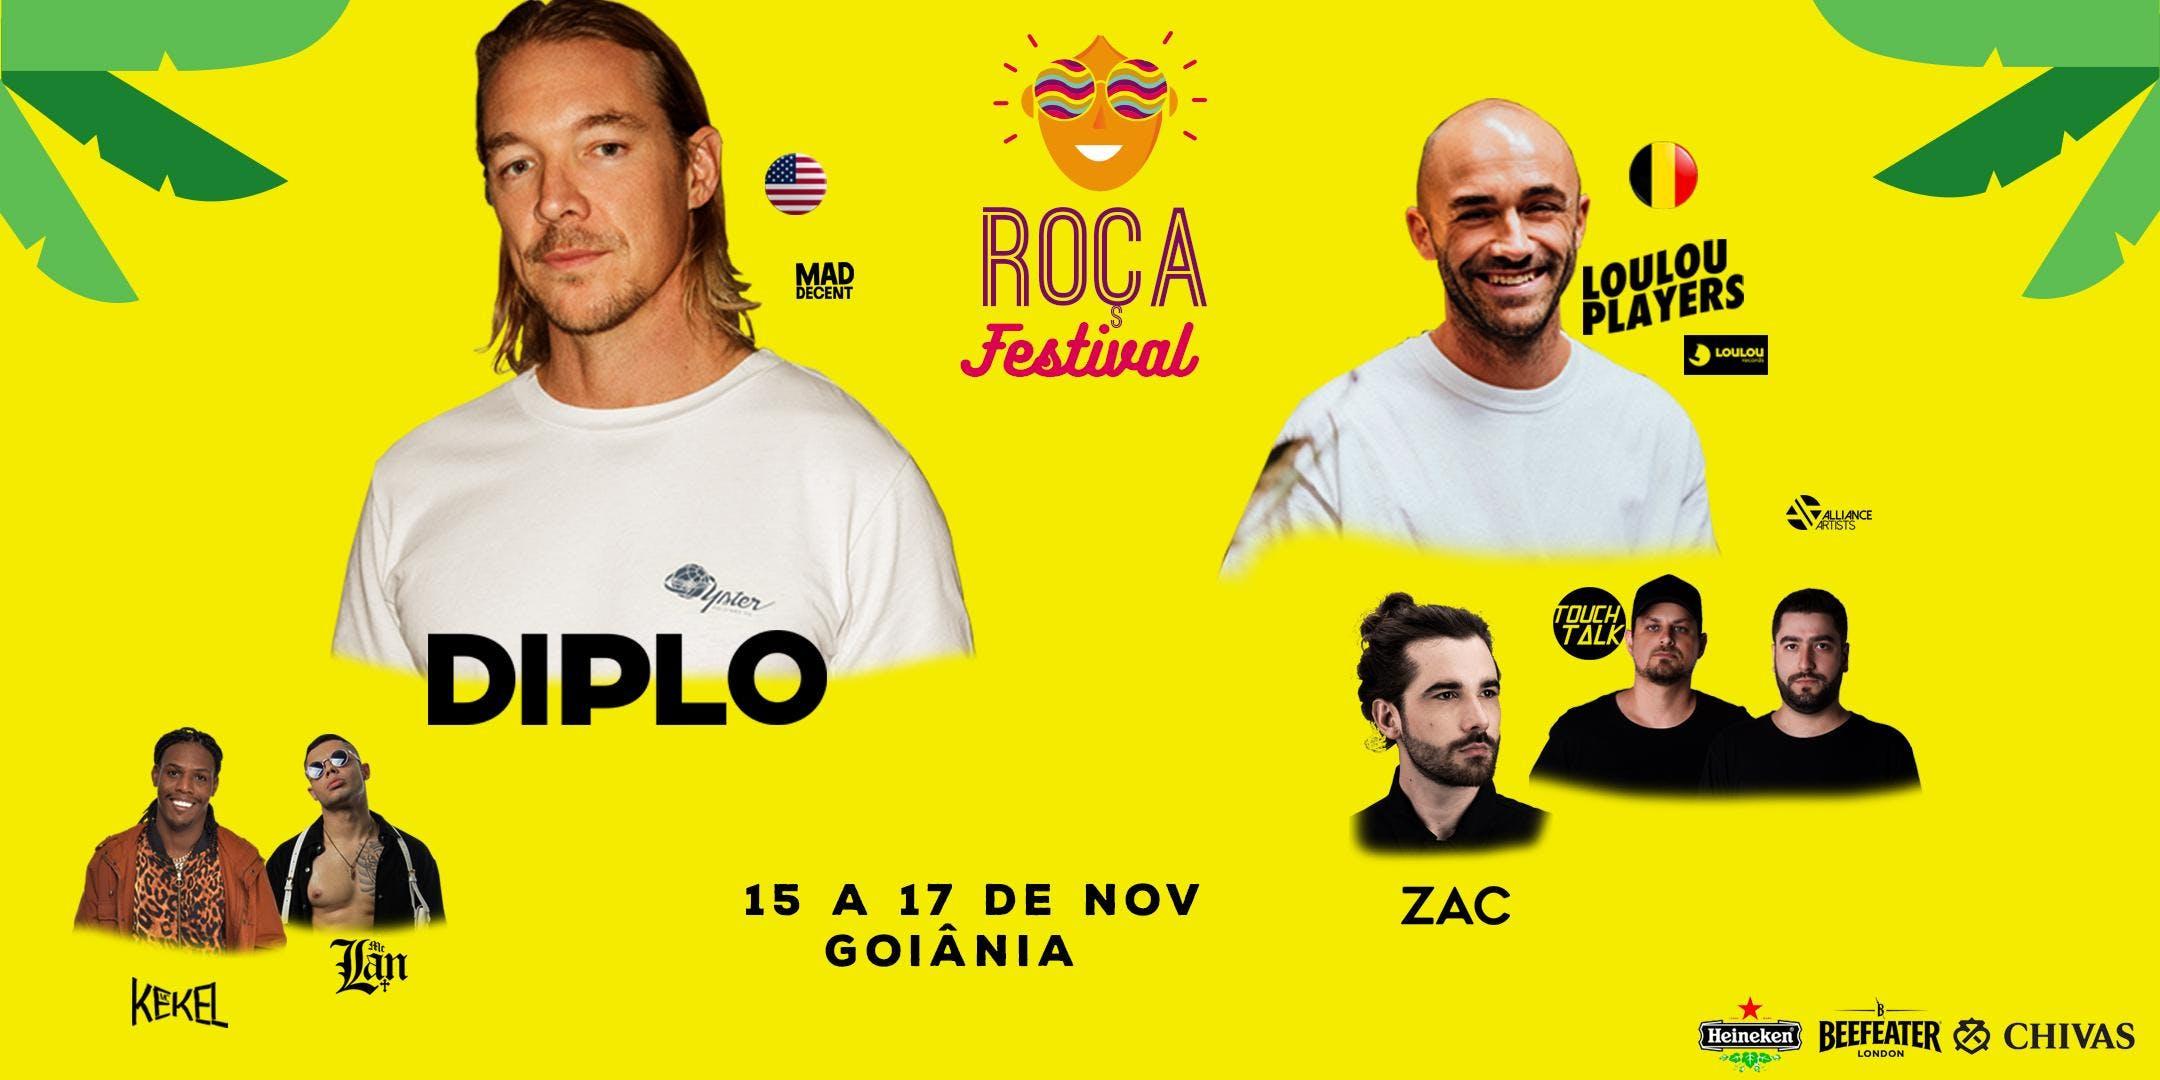 Roça Festival Apresenta: DIPLO